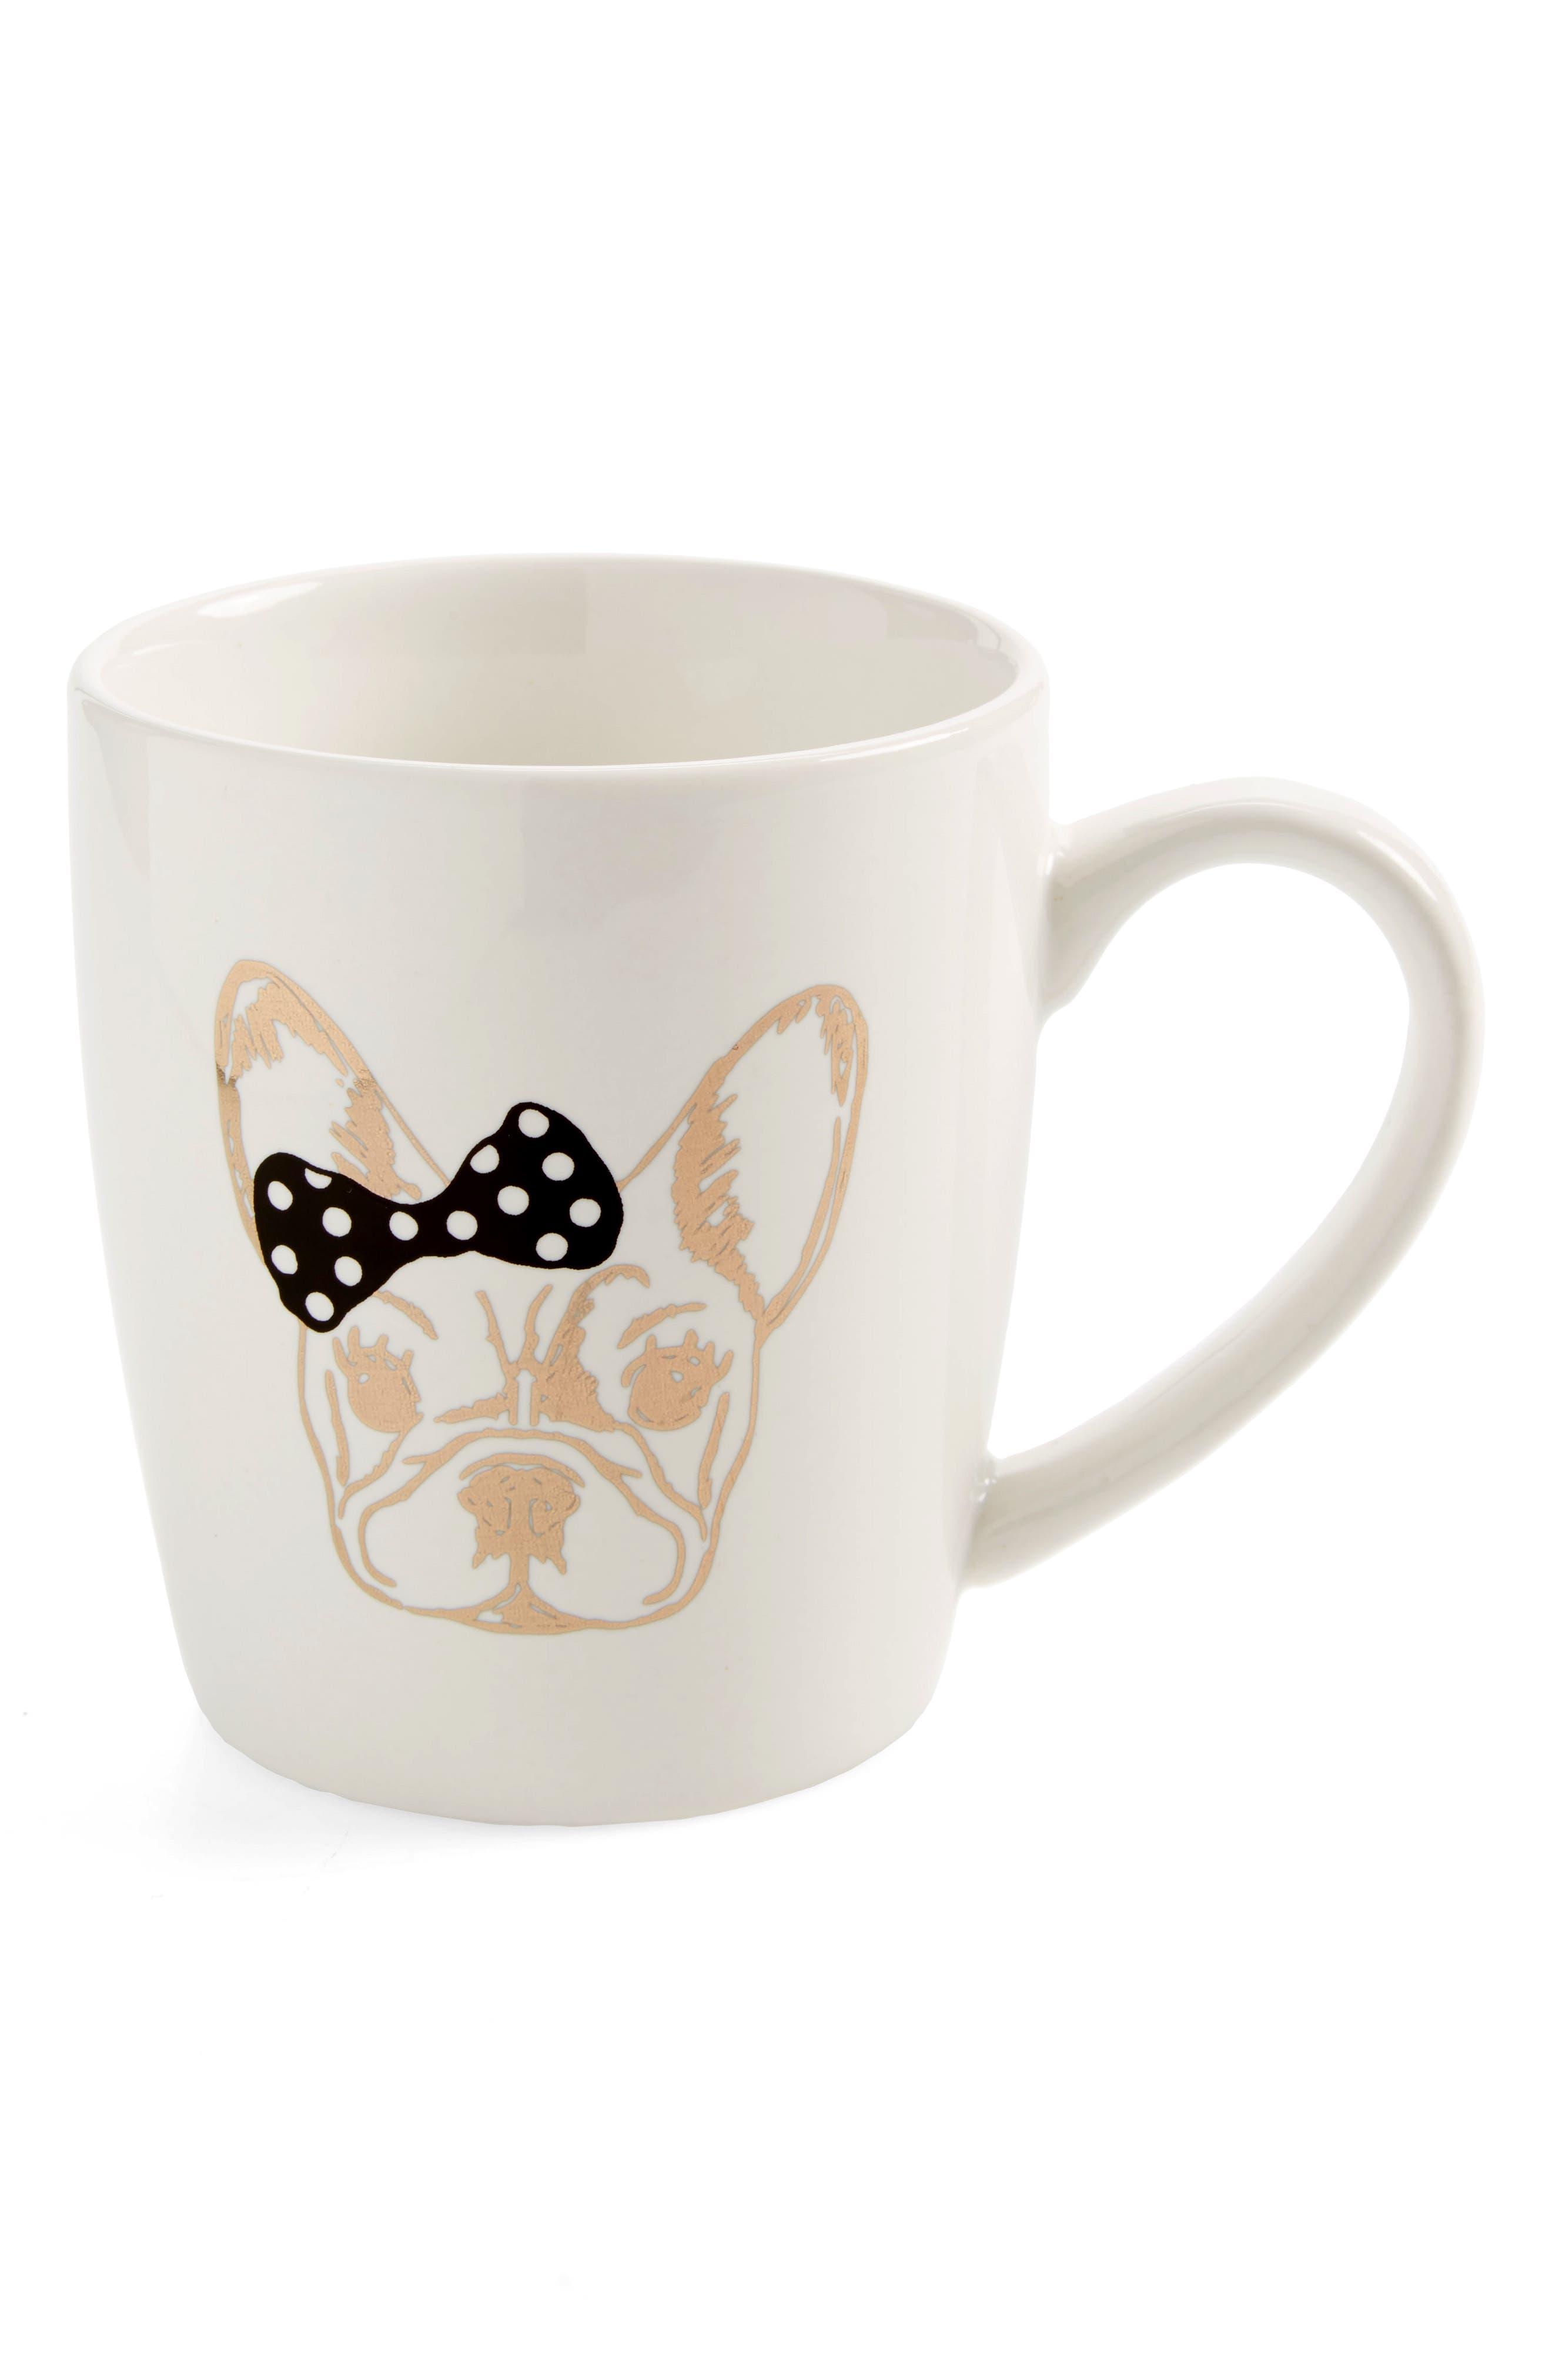 Main Image - American Atelier French Bulldog Mug